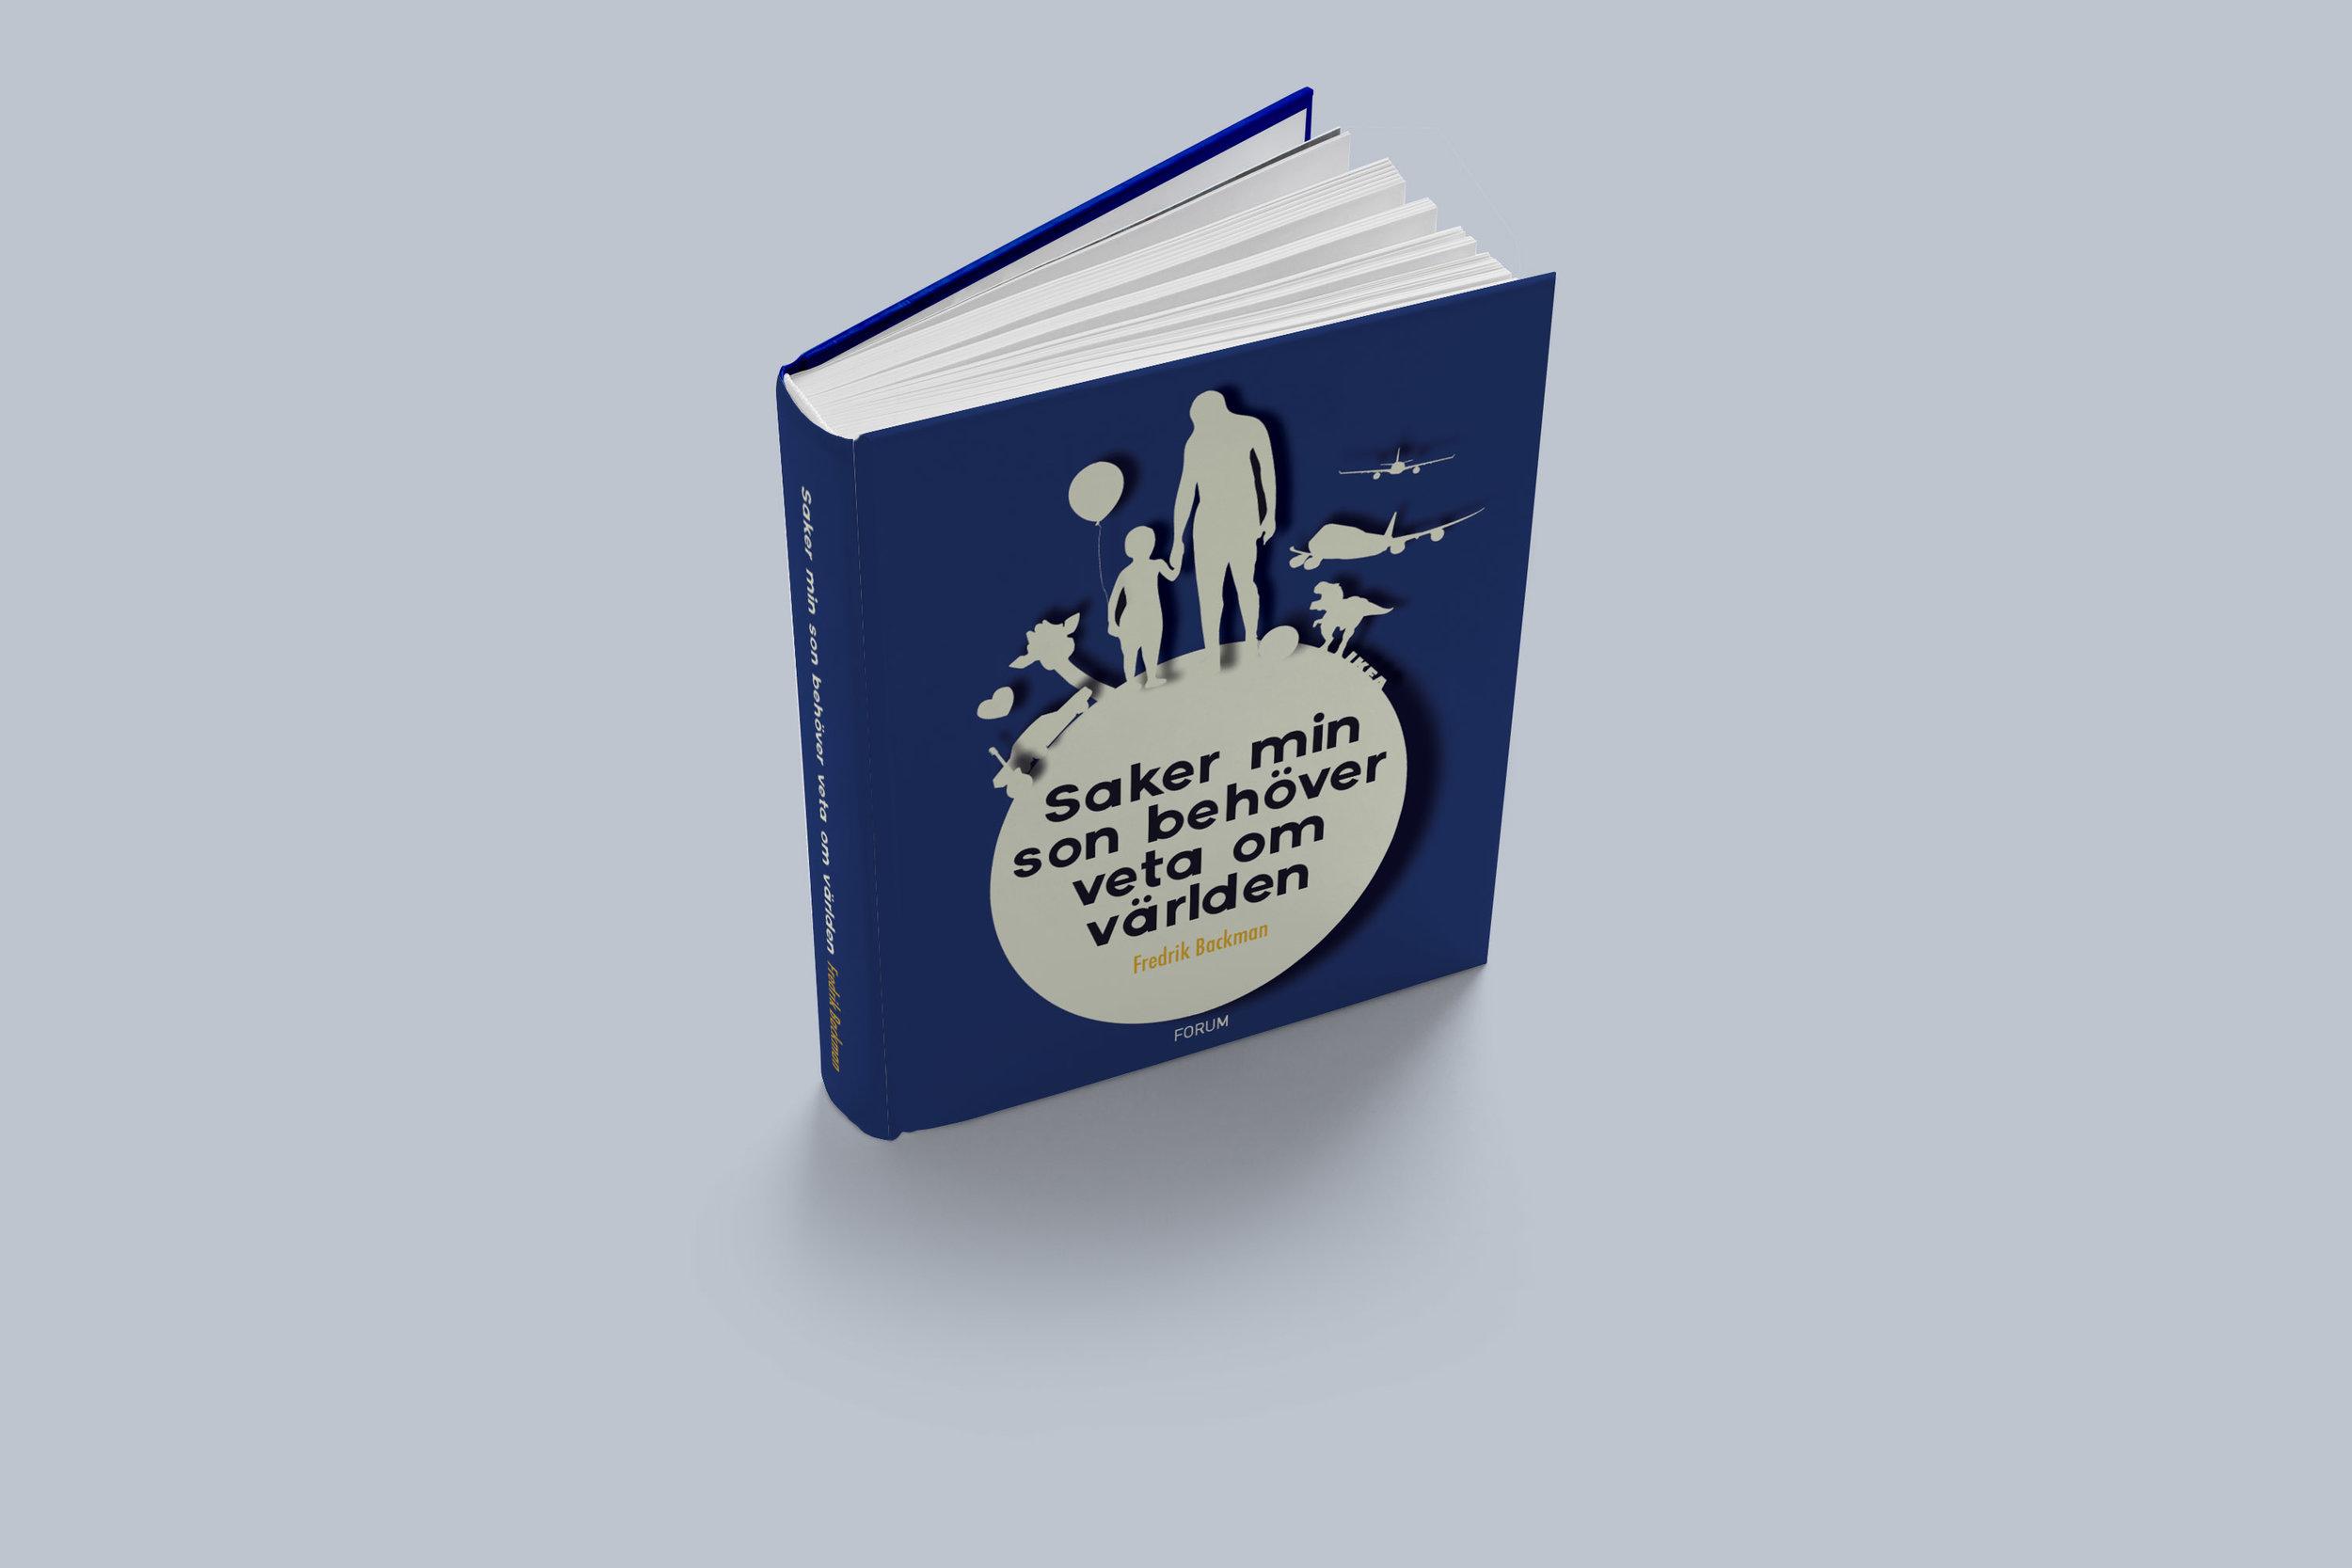 bokomslag 4-blue.jpg